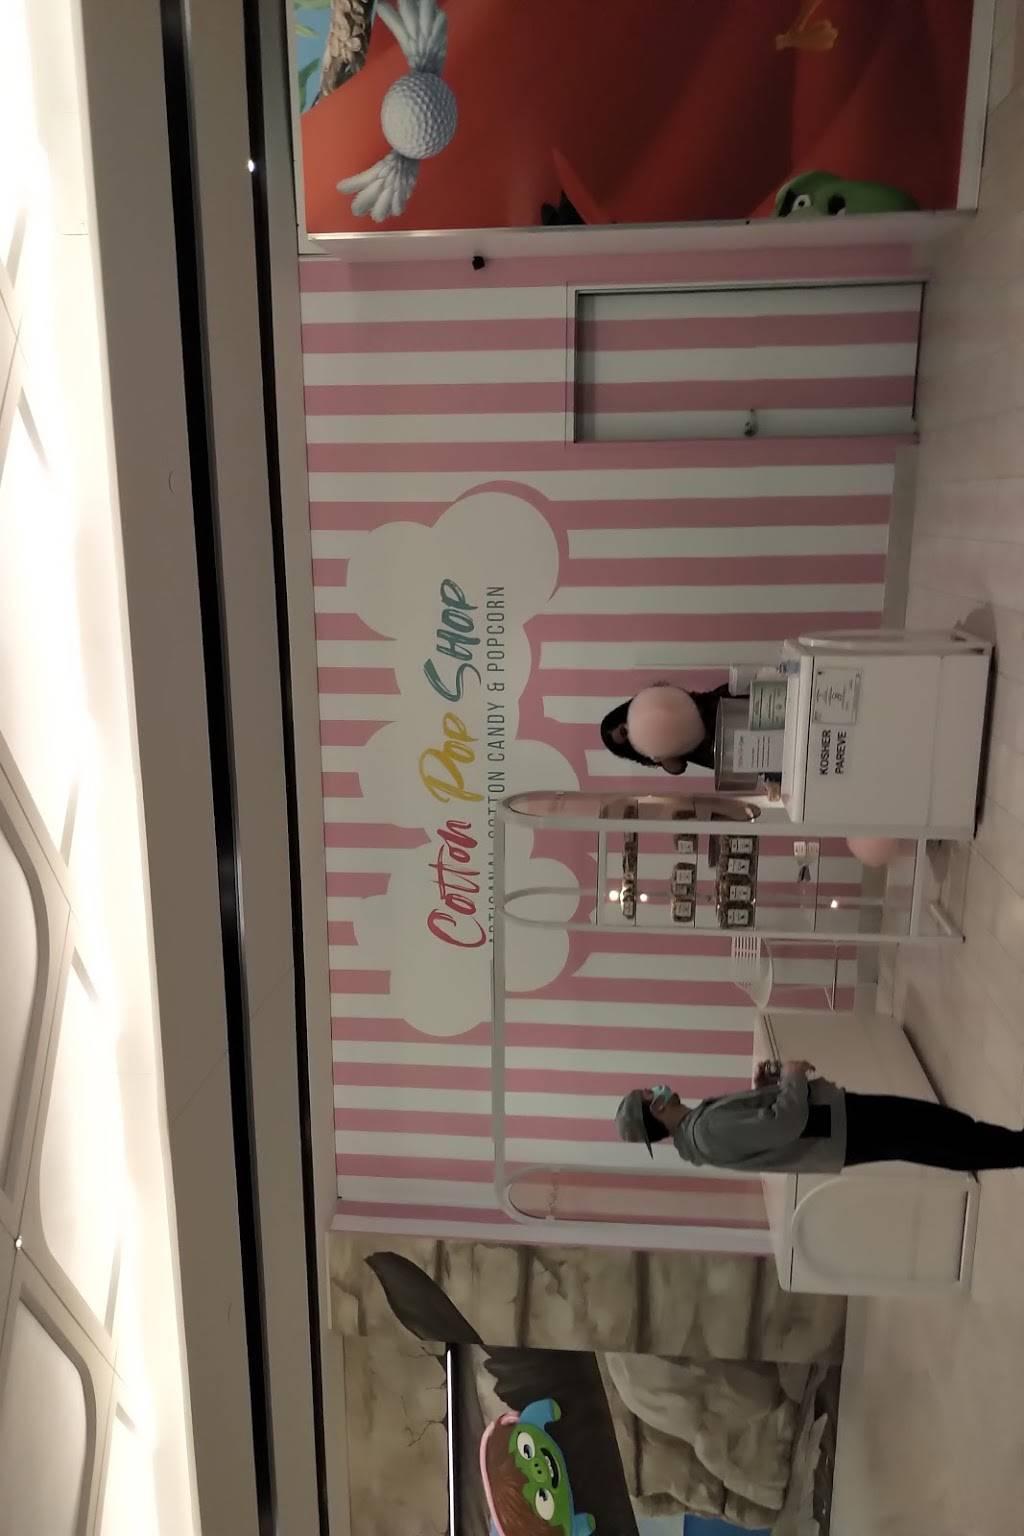 Cotton pop shop | restaurant | East Rutherford, NJ 07073, USA